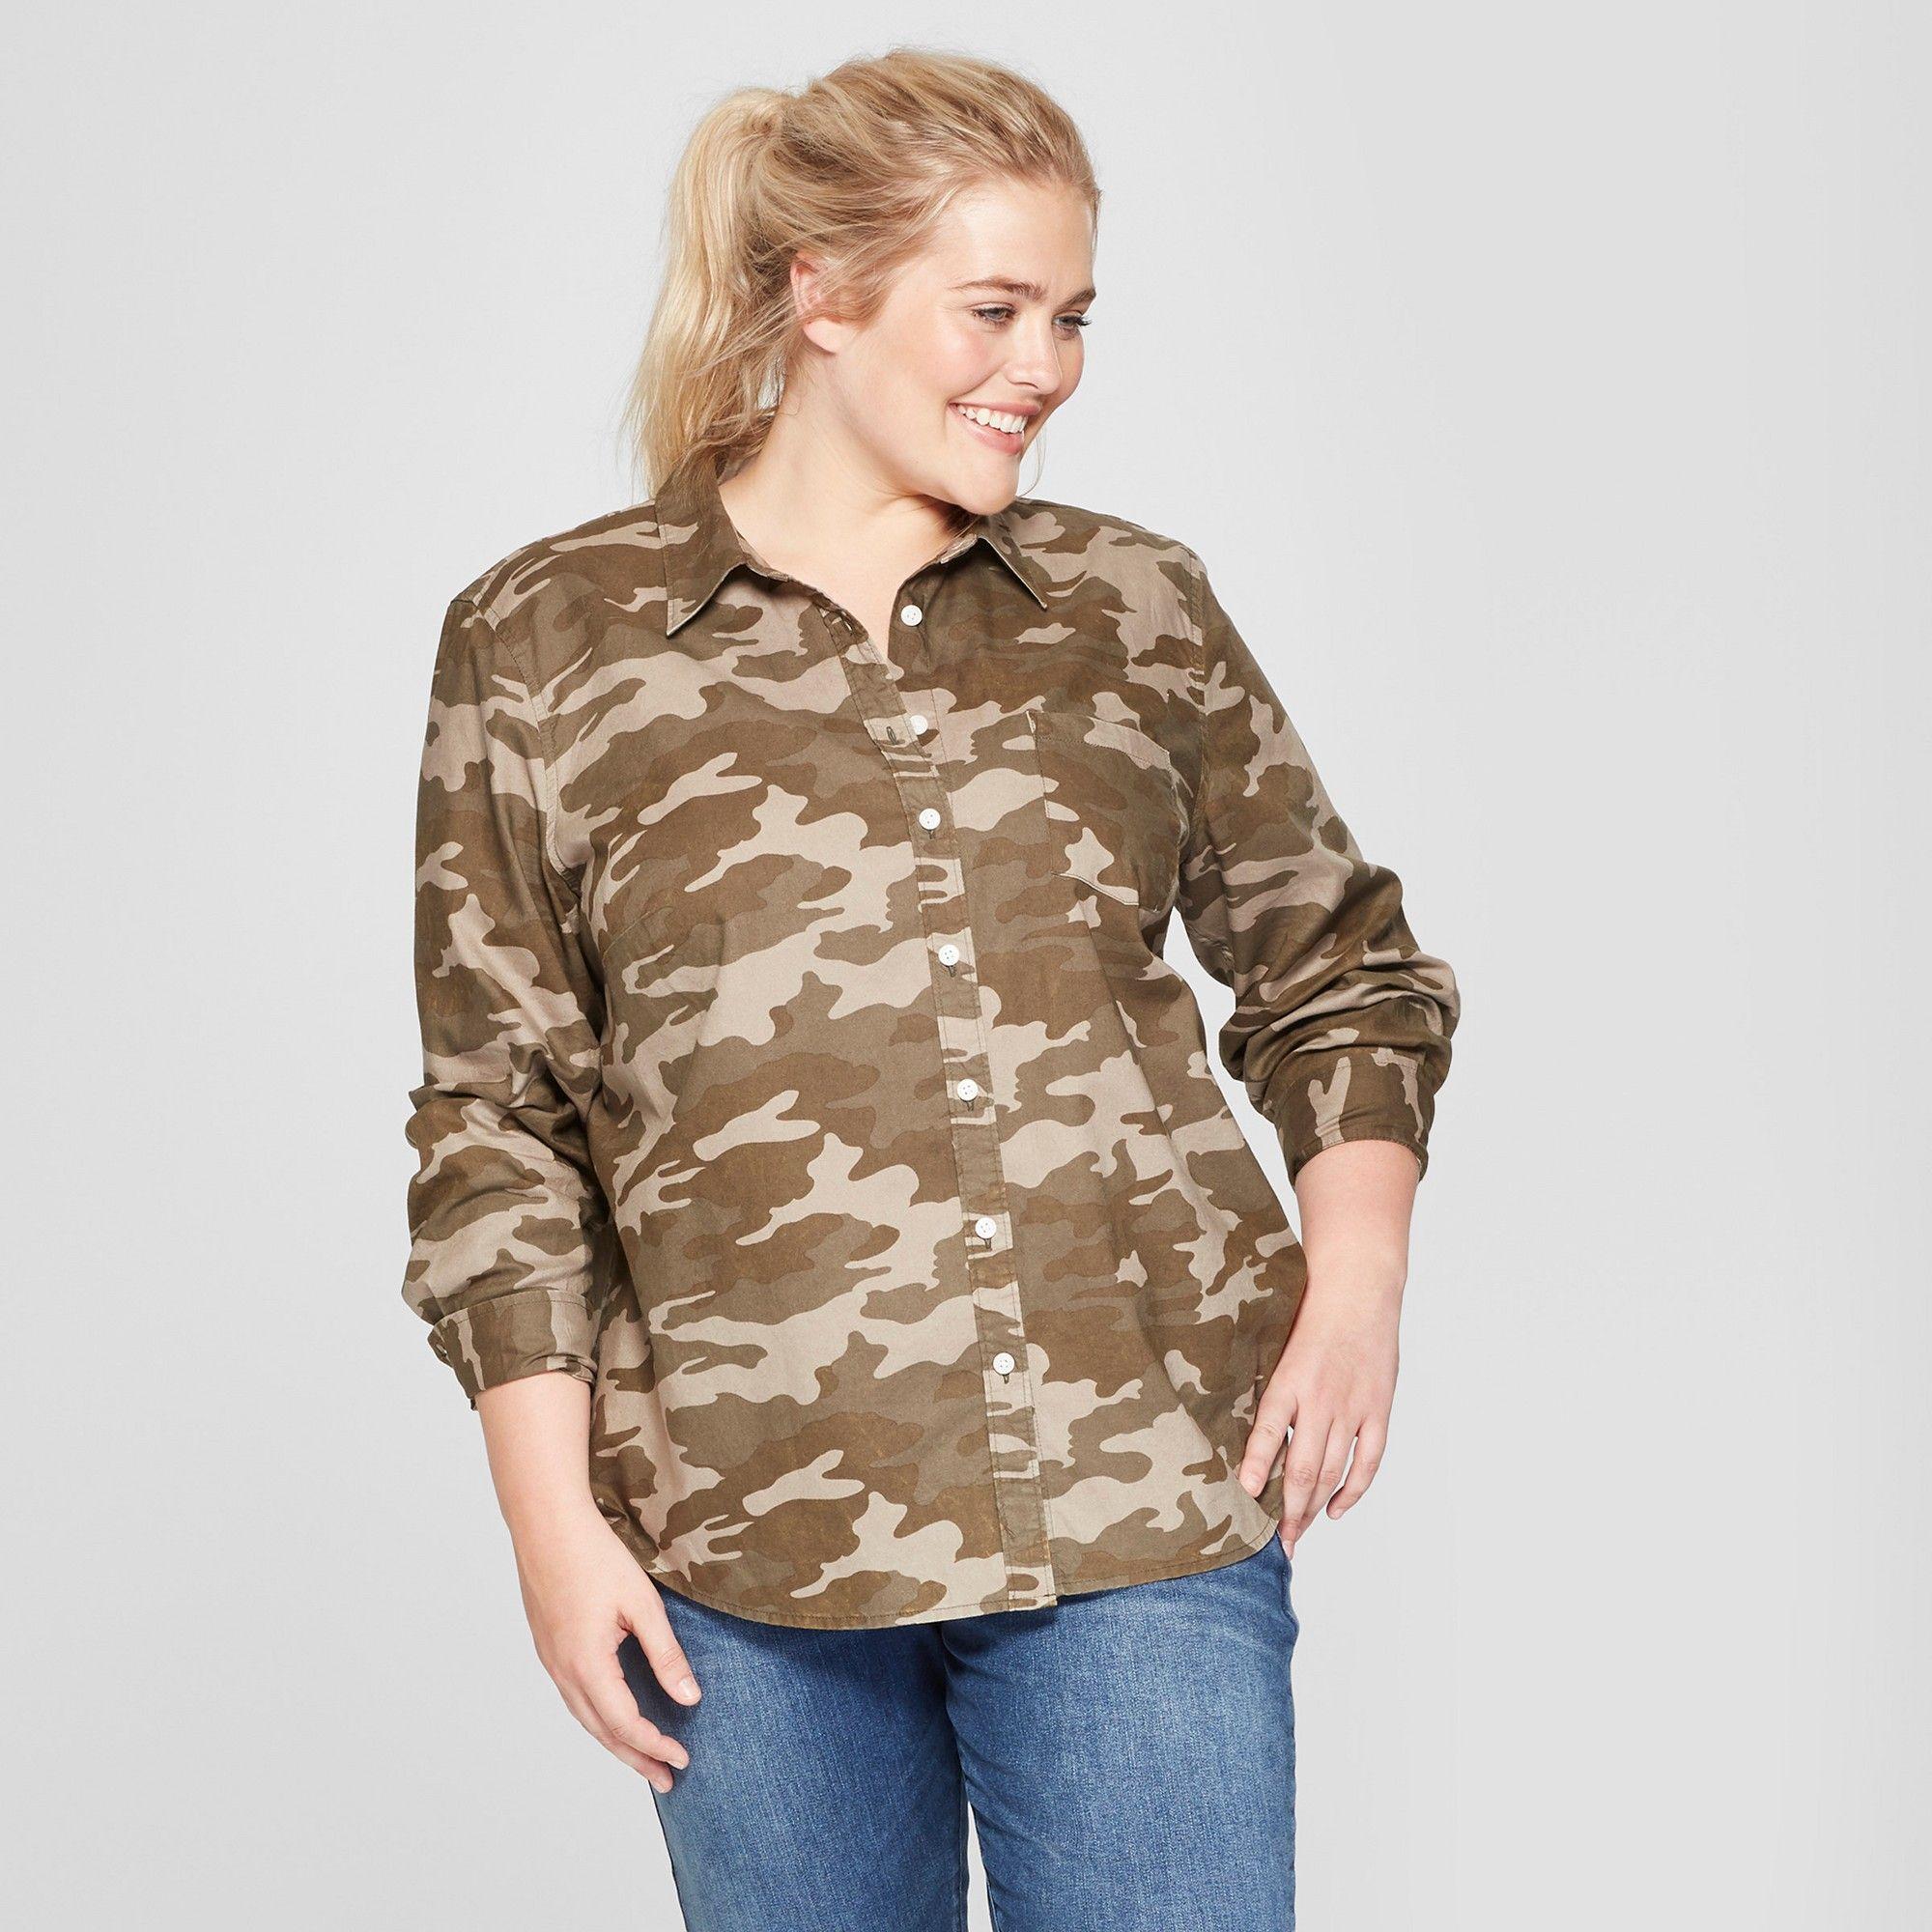 95c28fb2 Women's Plus Size Camo Print Long Sleeve Camden Button-Down Shirt - Universal  Thread Olive 4X, Green